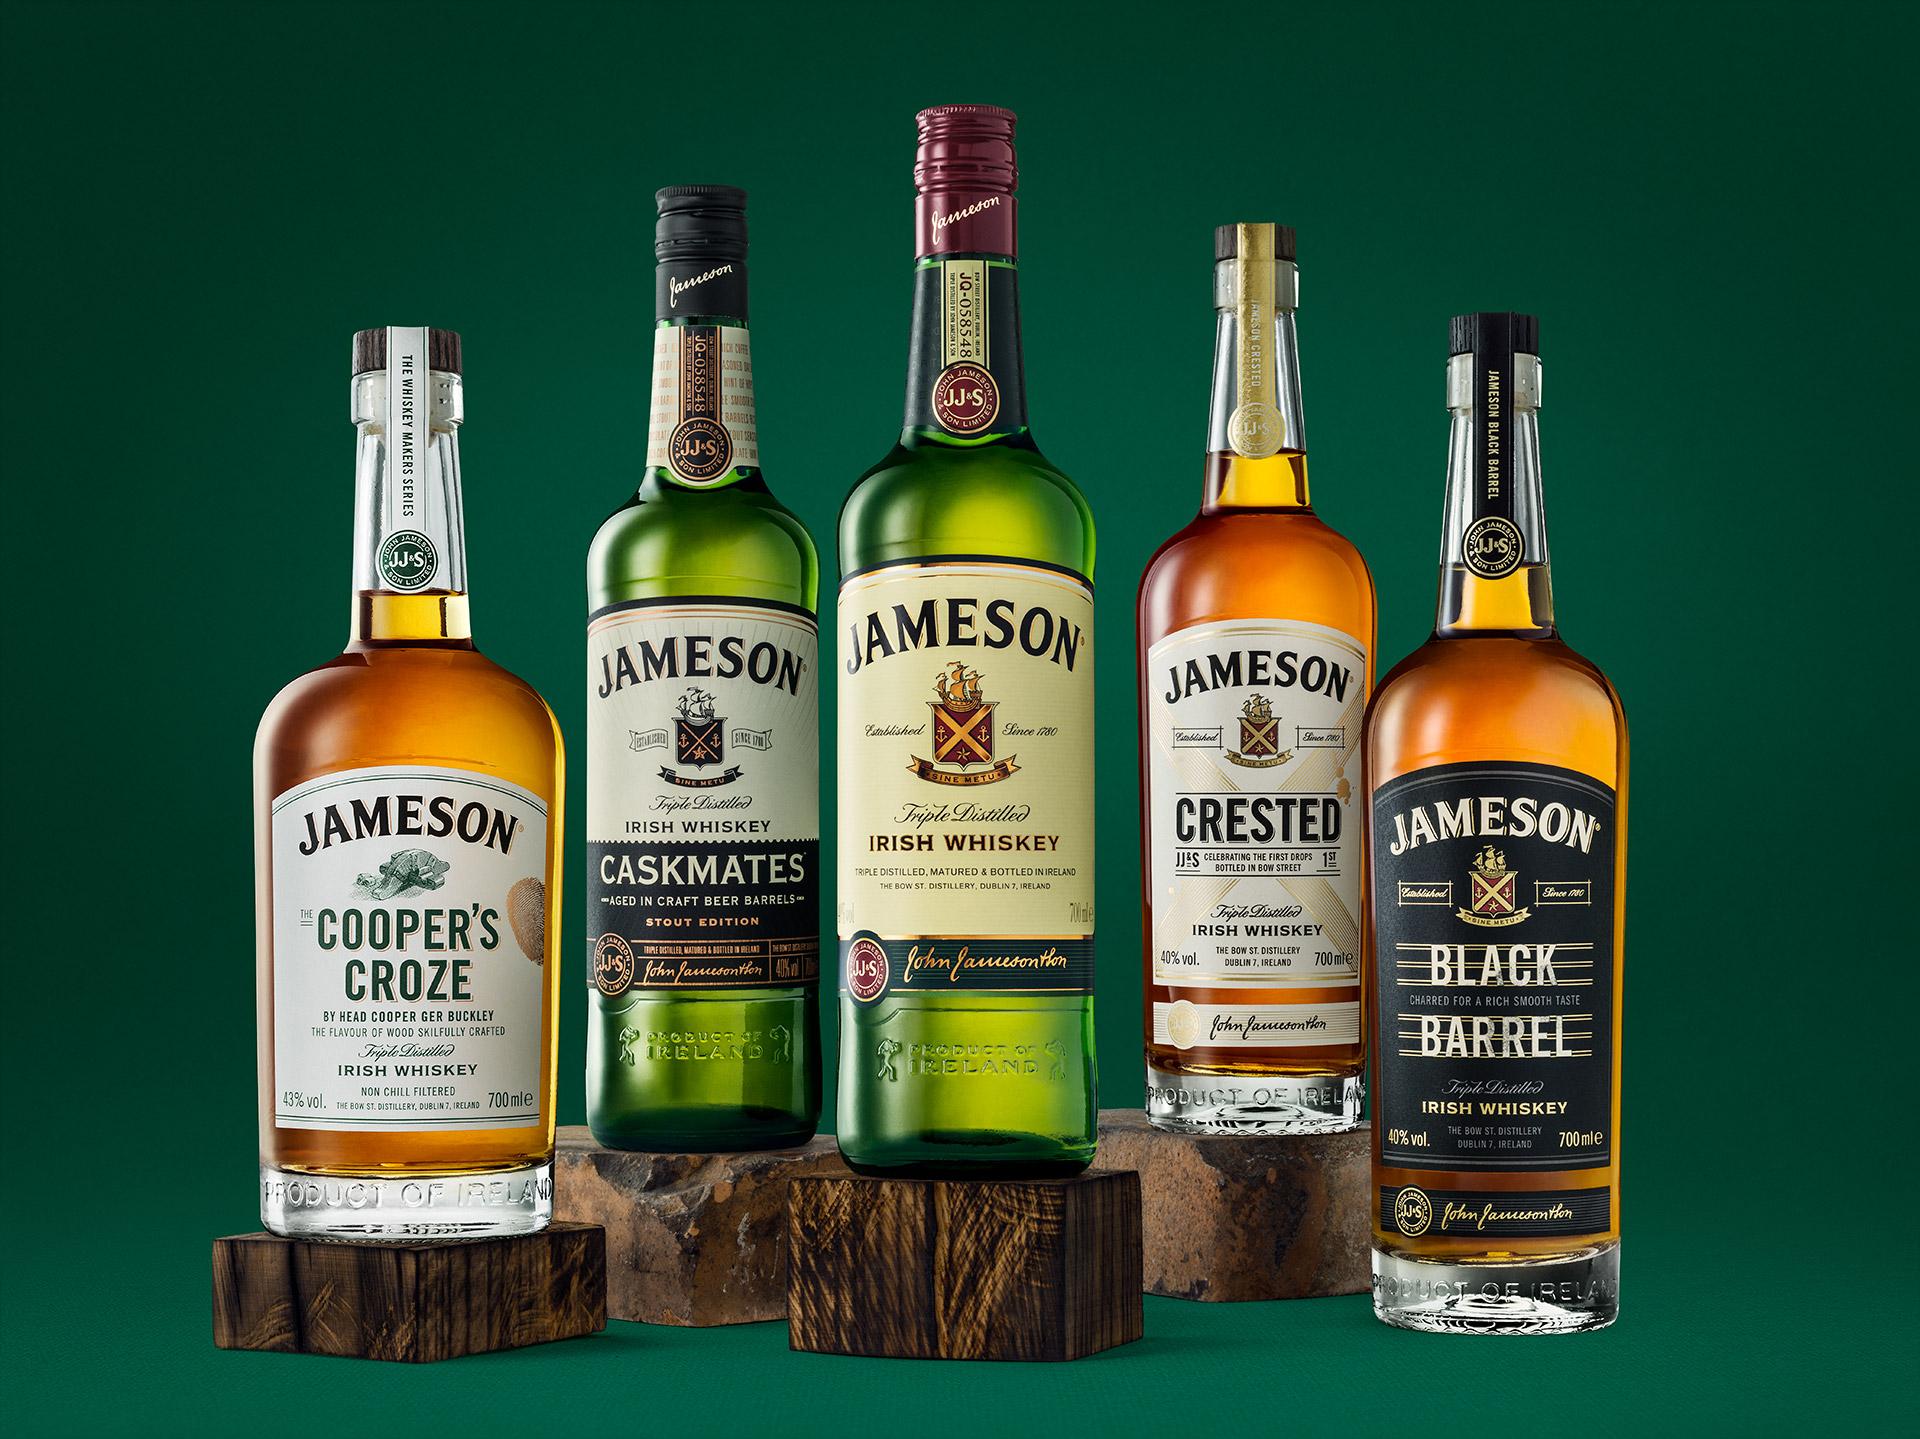 jameson_corporate_family_2_green_WEB.jpg